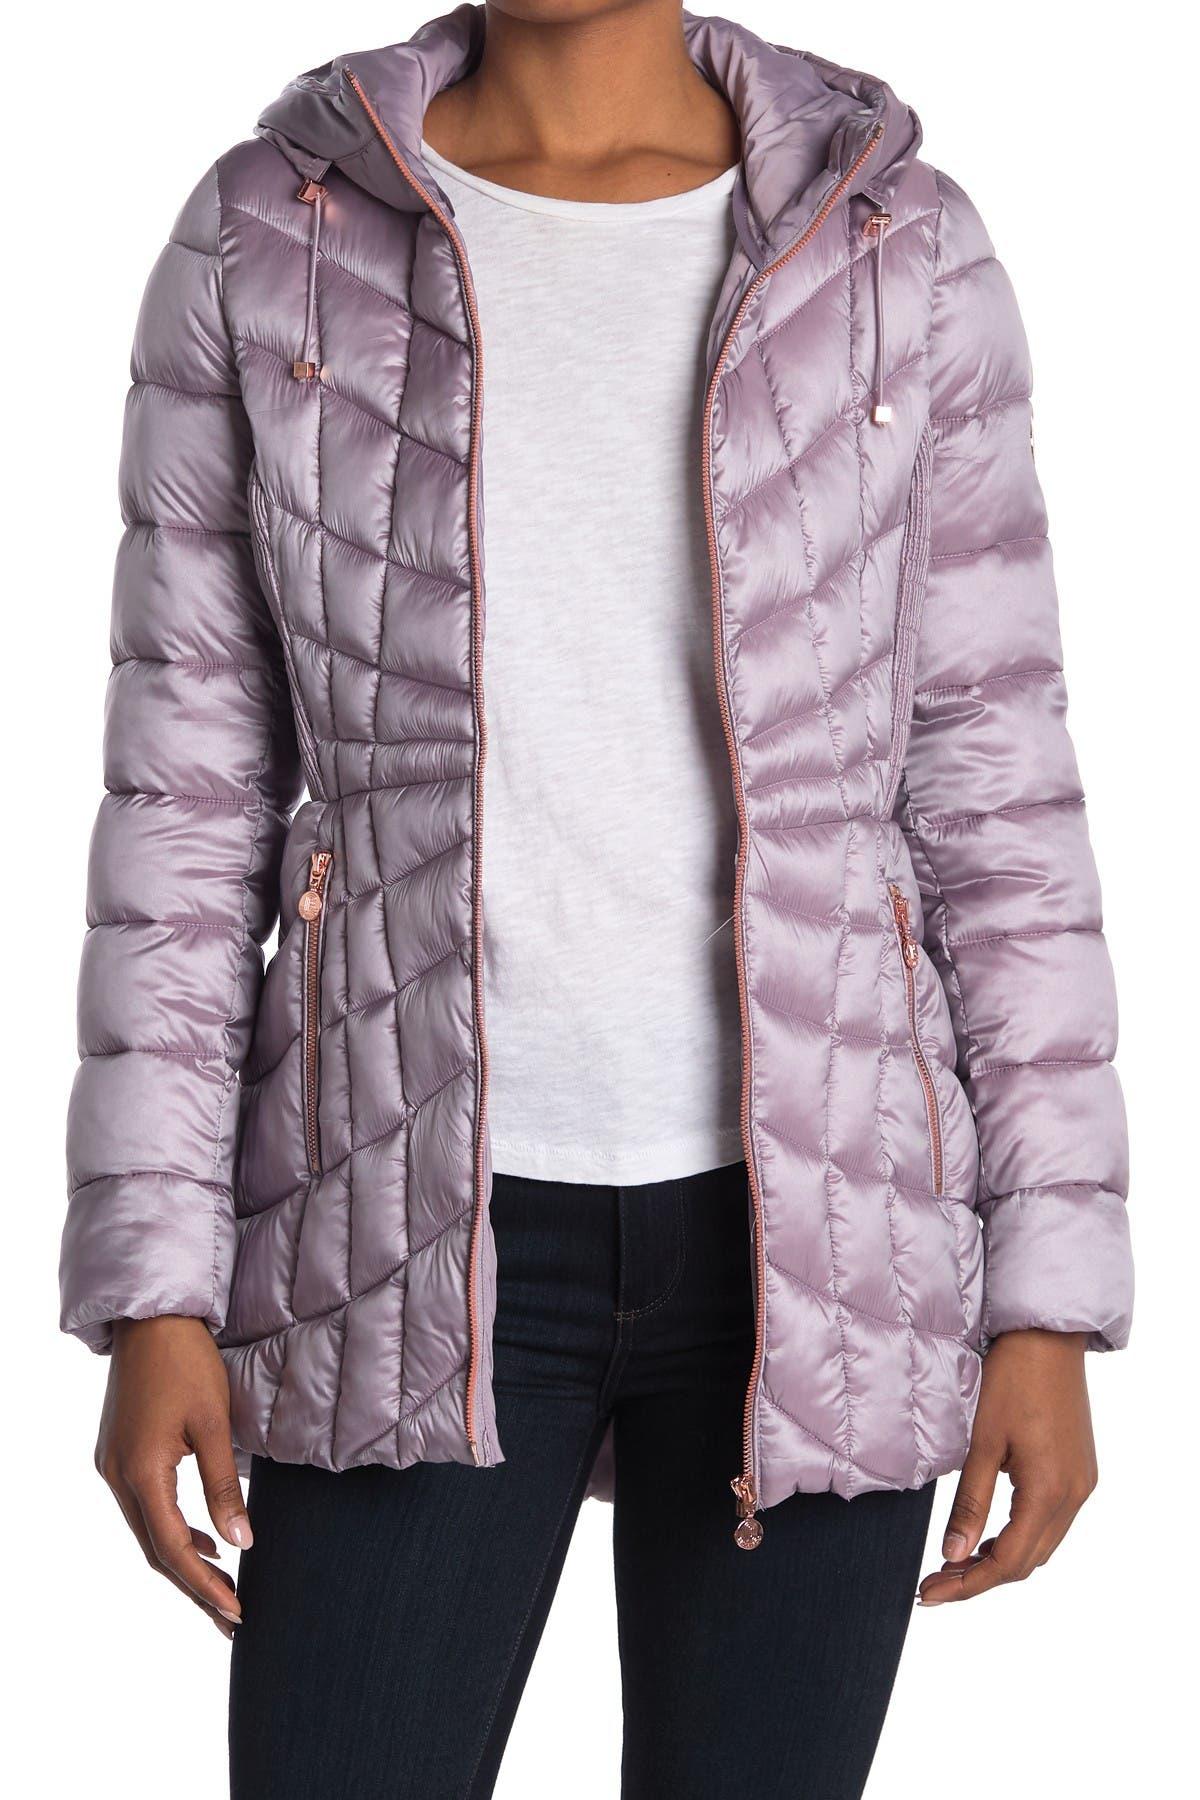 Image of Bernardo Quilted Packable Jacket w/ Hood